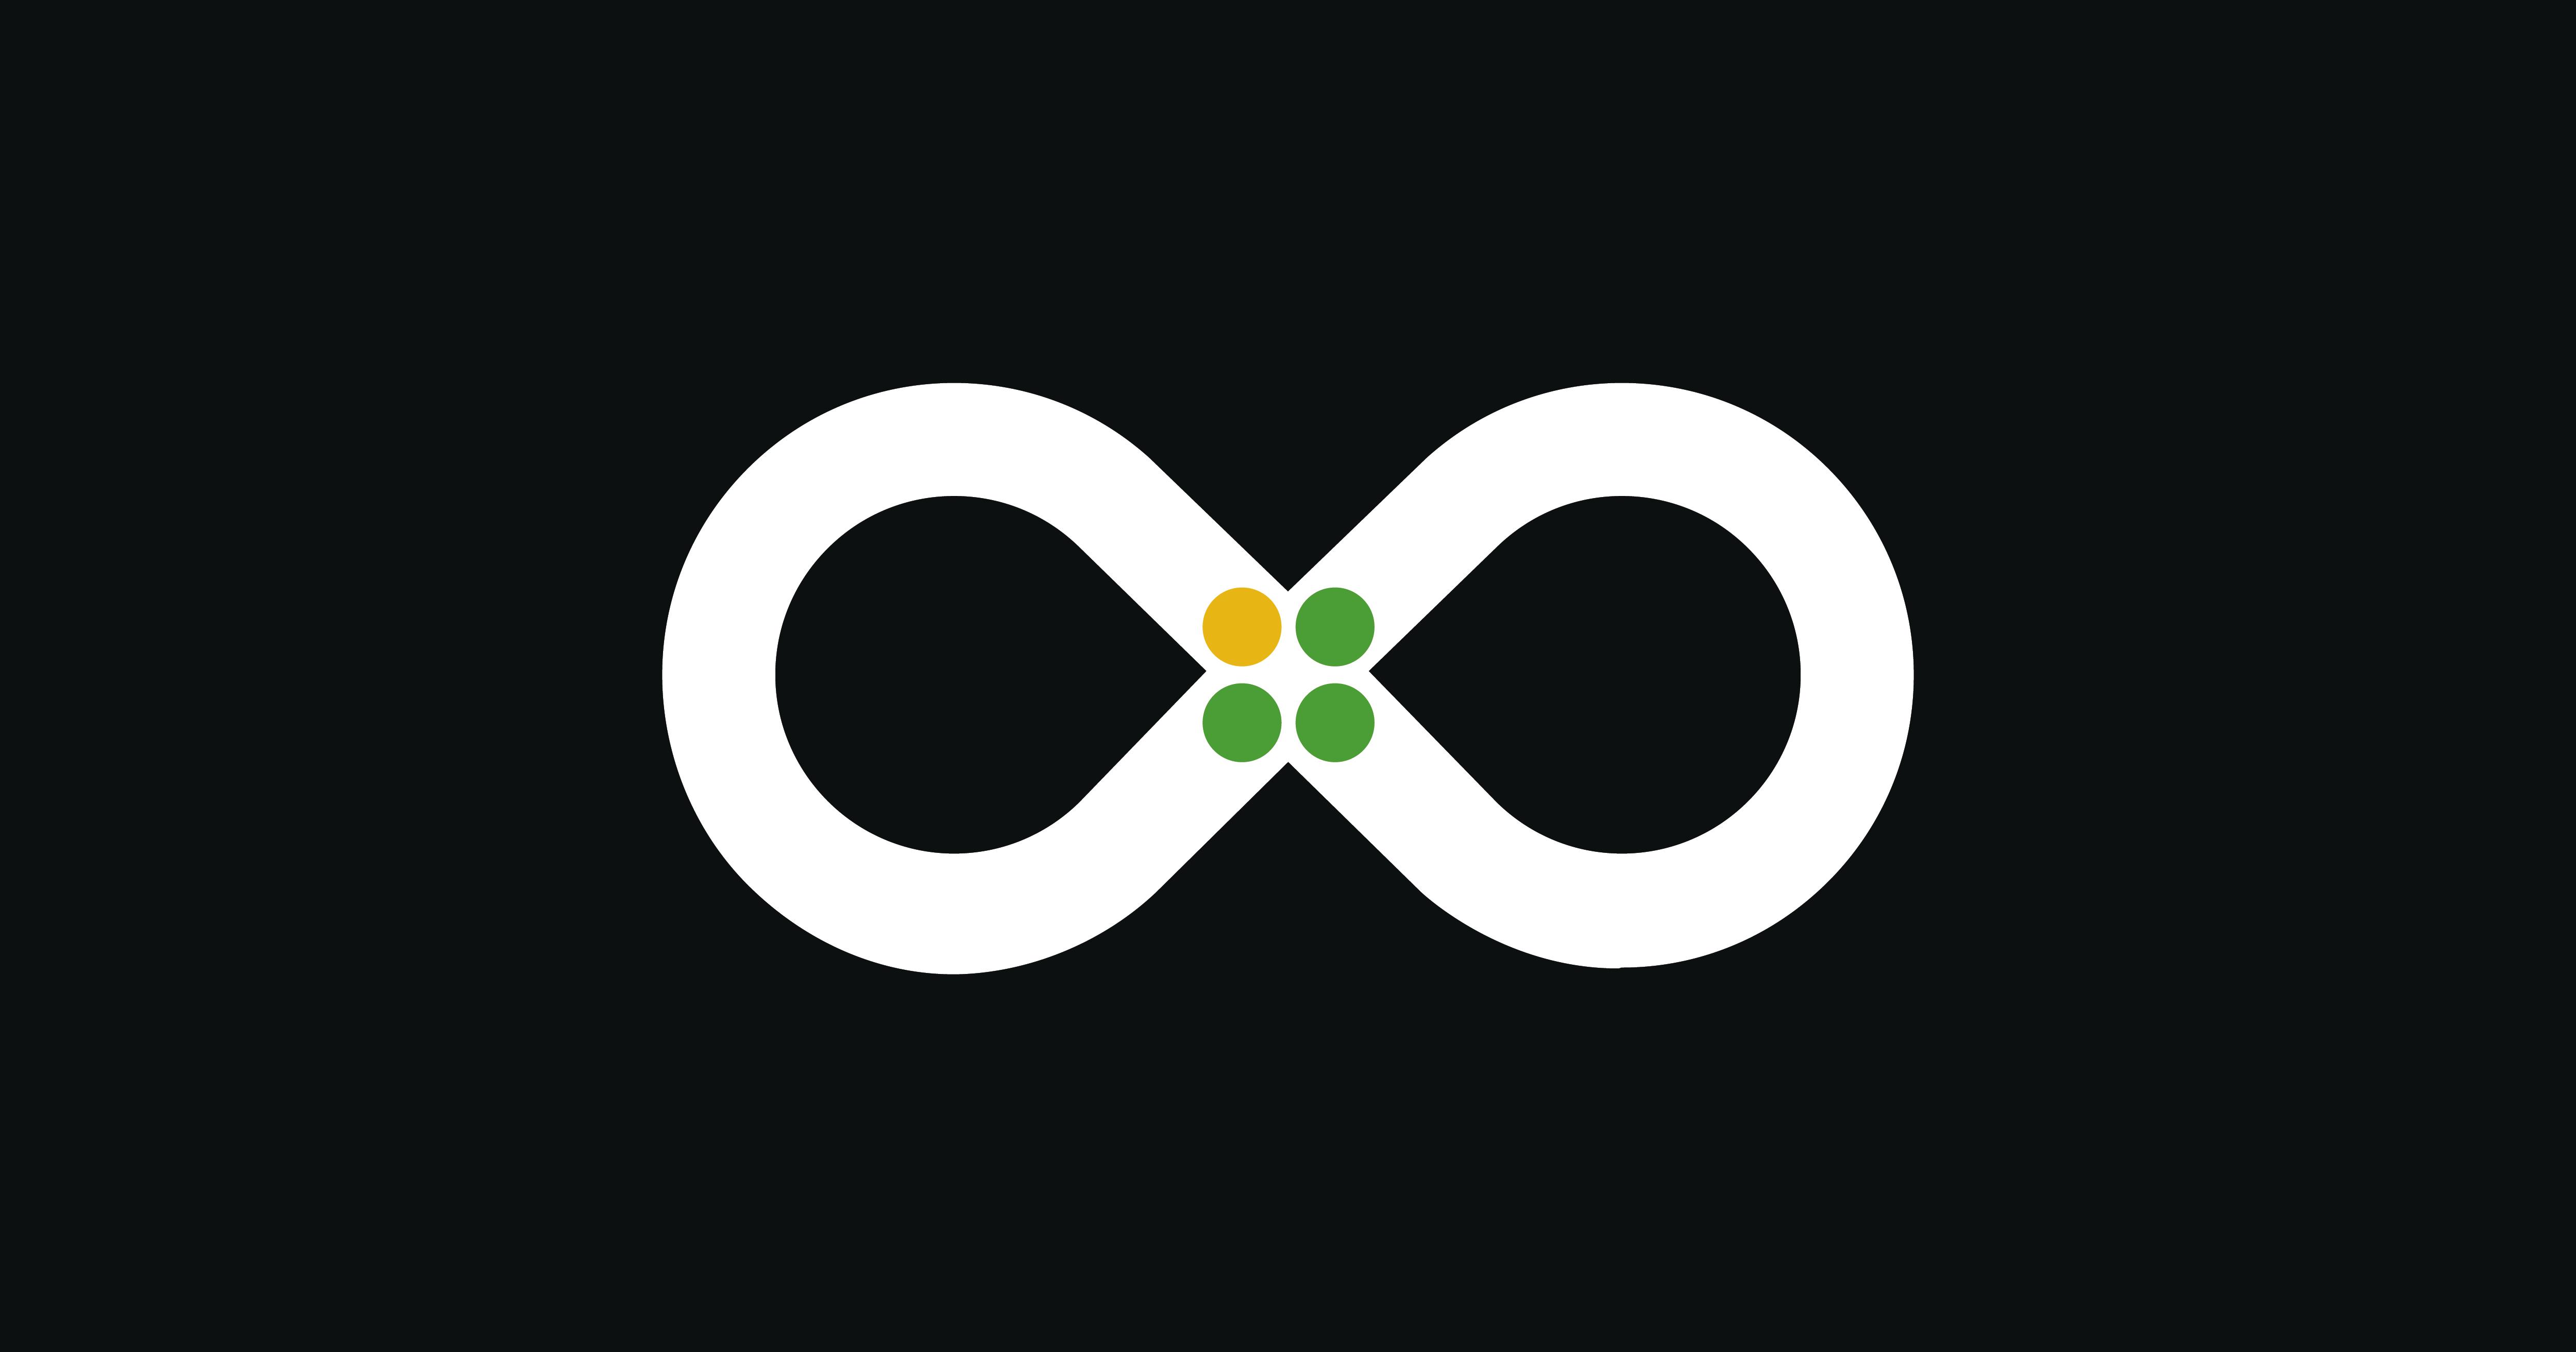 The Loop Ibm Design Thinking Icon Design Design Understanding